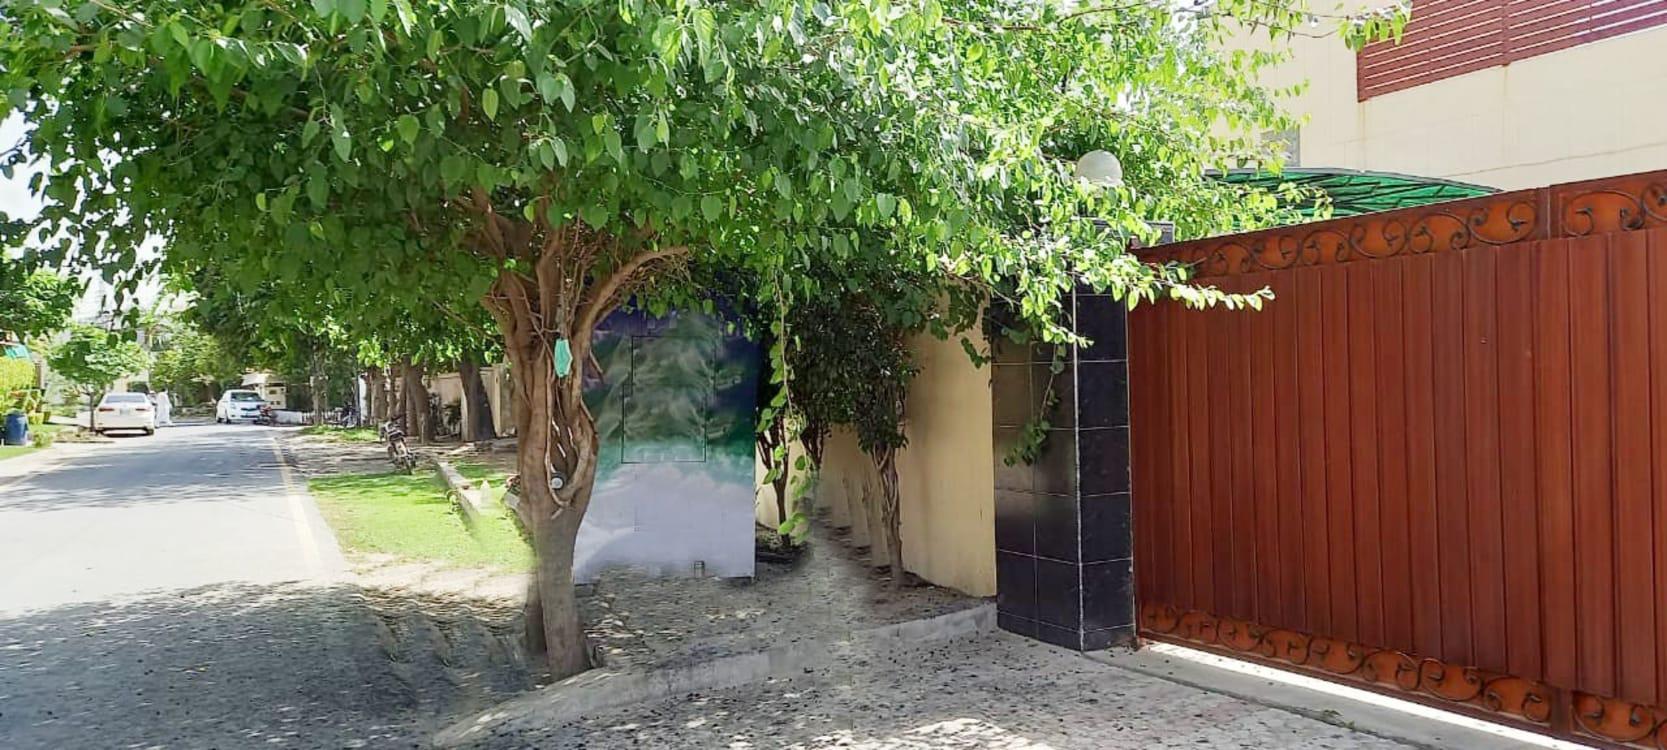 2.4 Kanal House For Rent | Graana.com